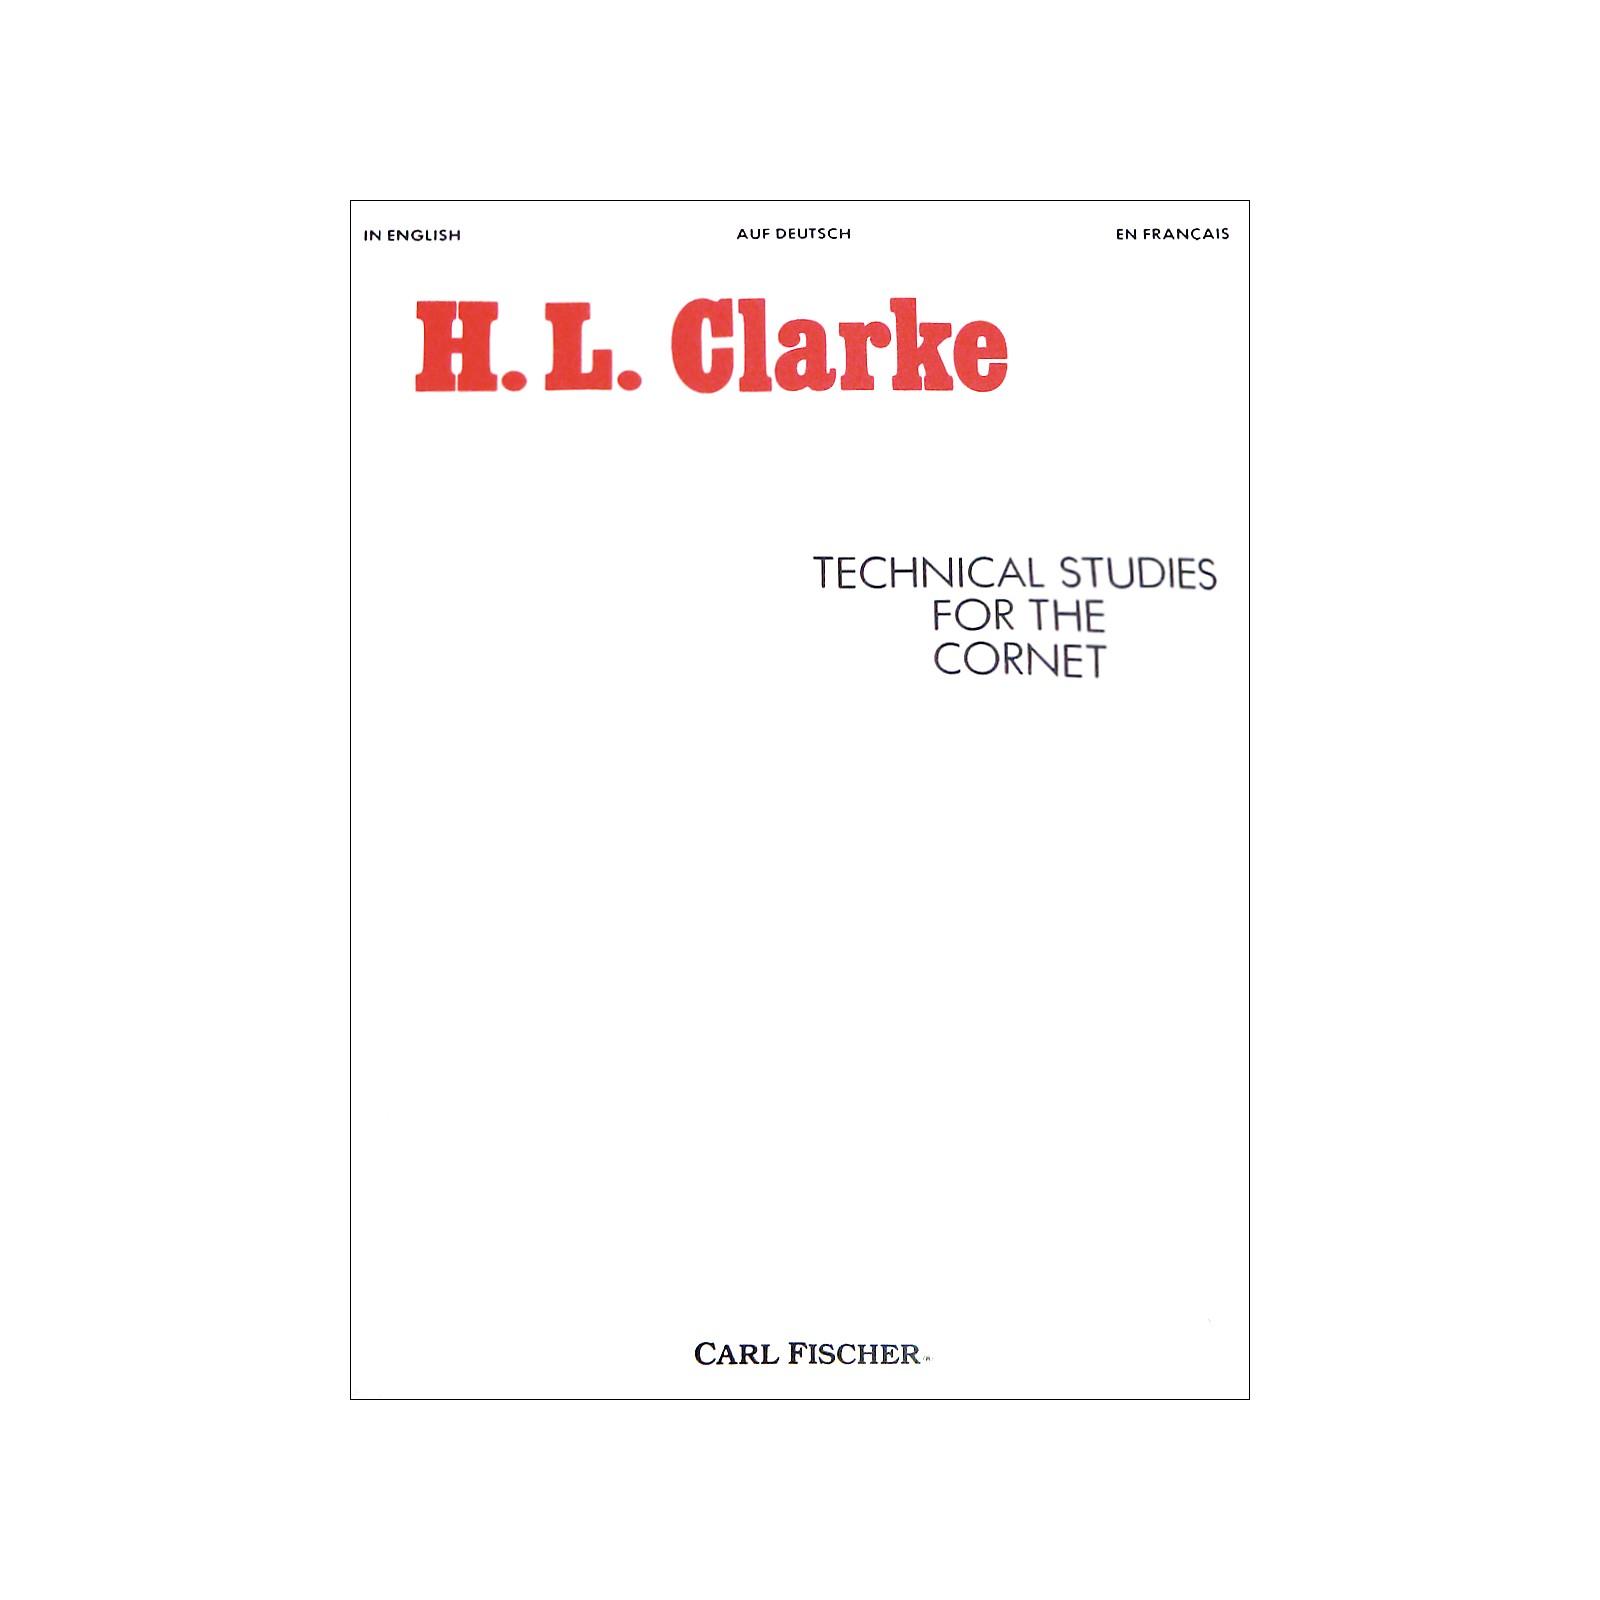 Carl Fischer Technical Studies for the Cornet